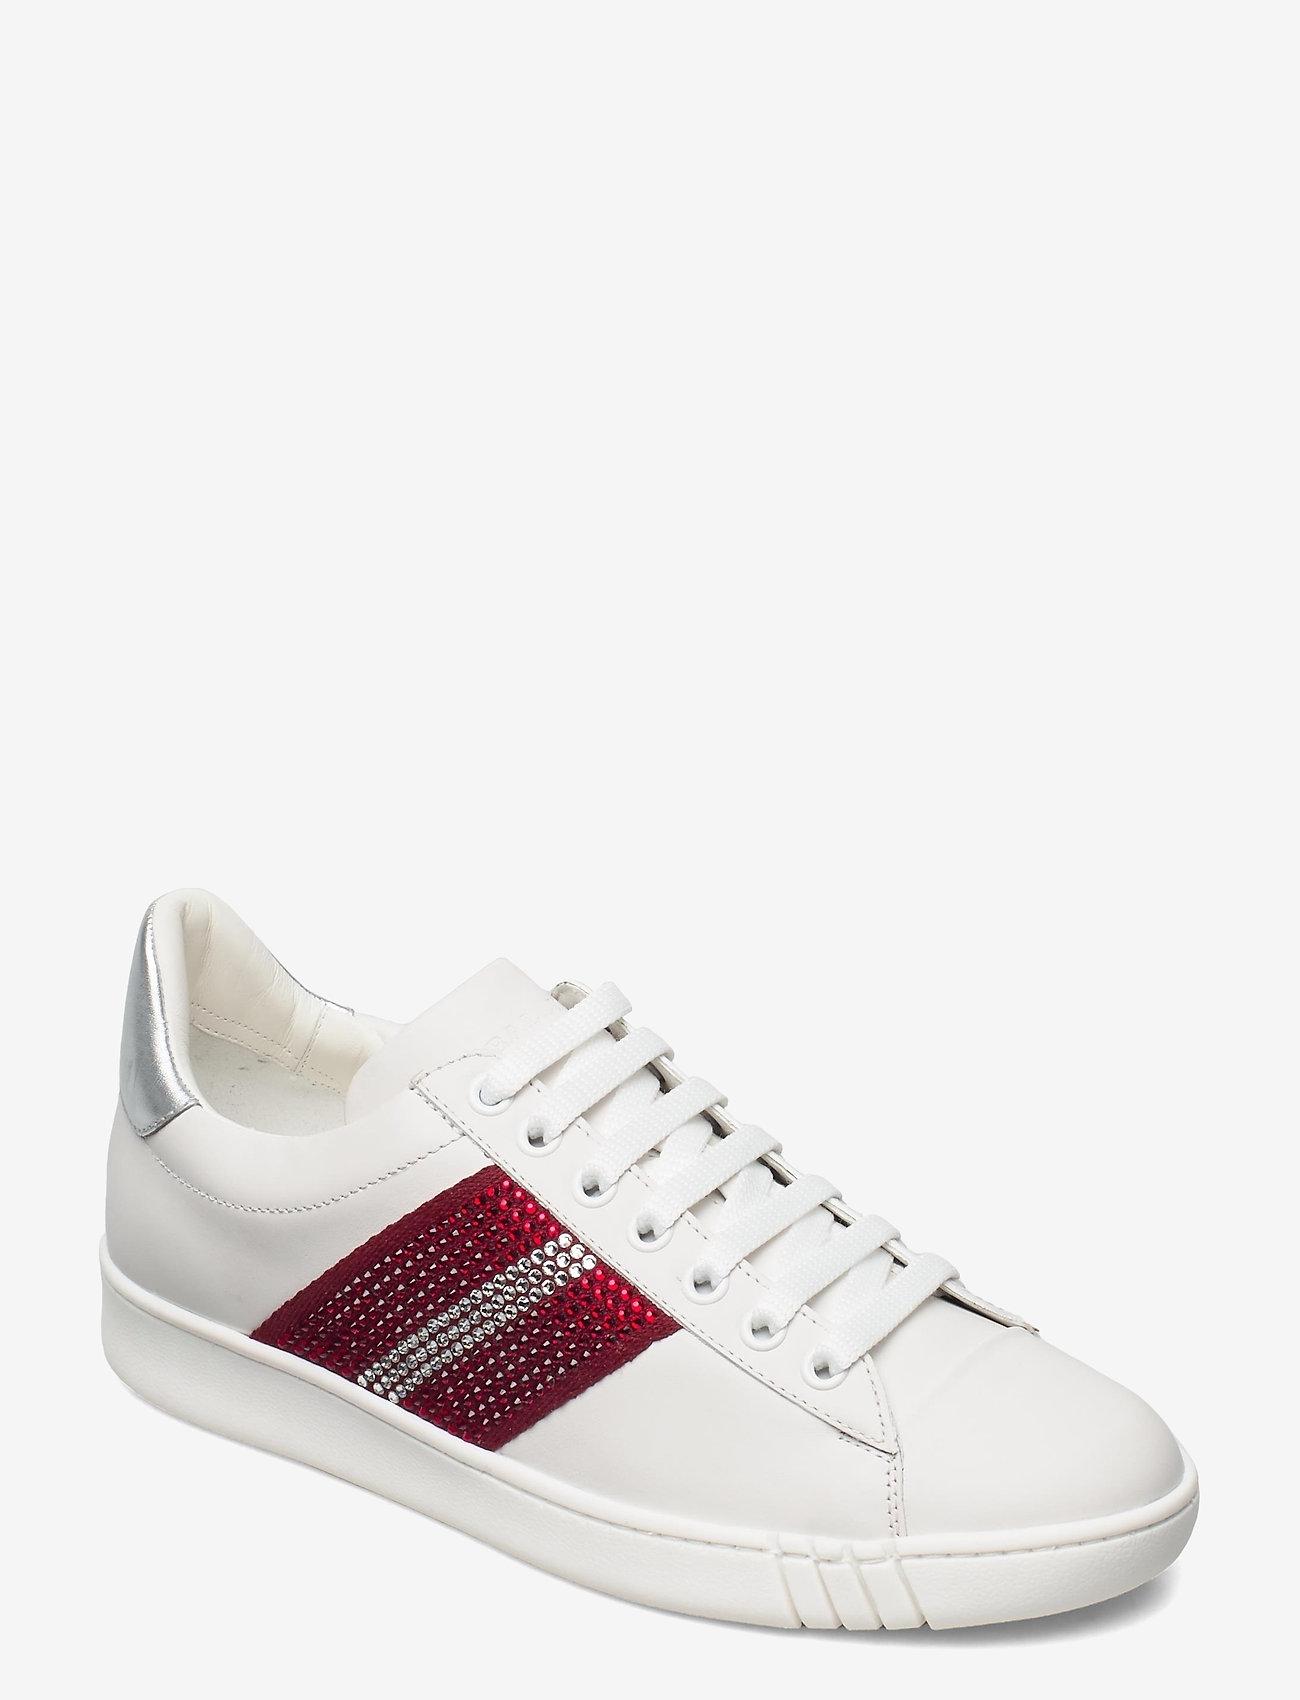 Bally - WIERA-TSP/08 - lage sneakers - white/tsp bally - 0